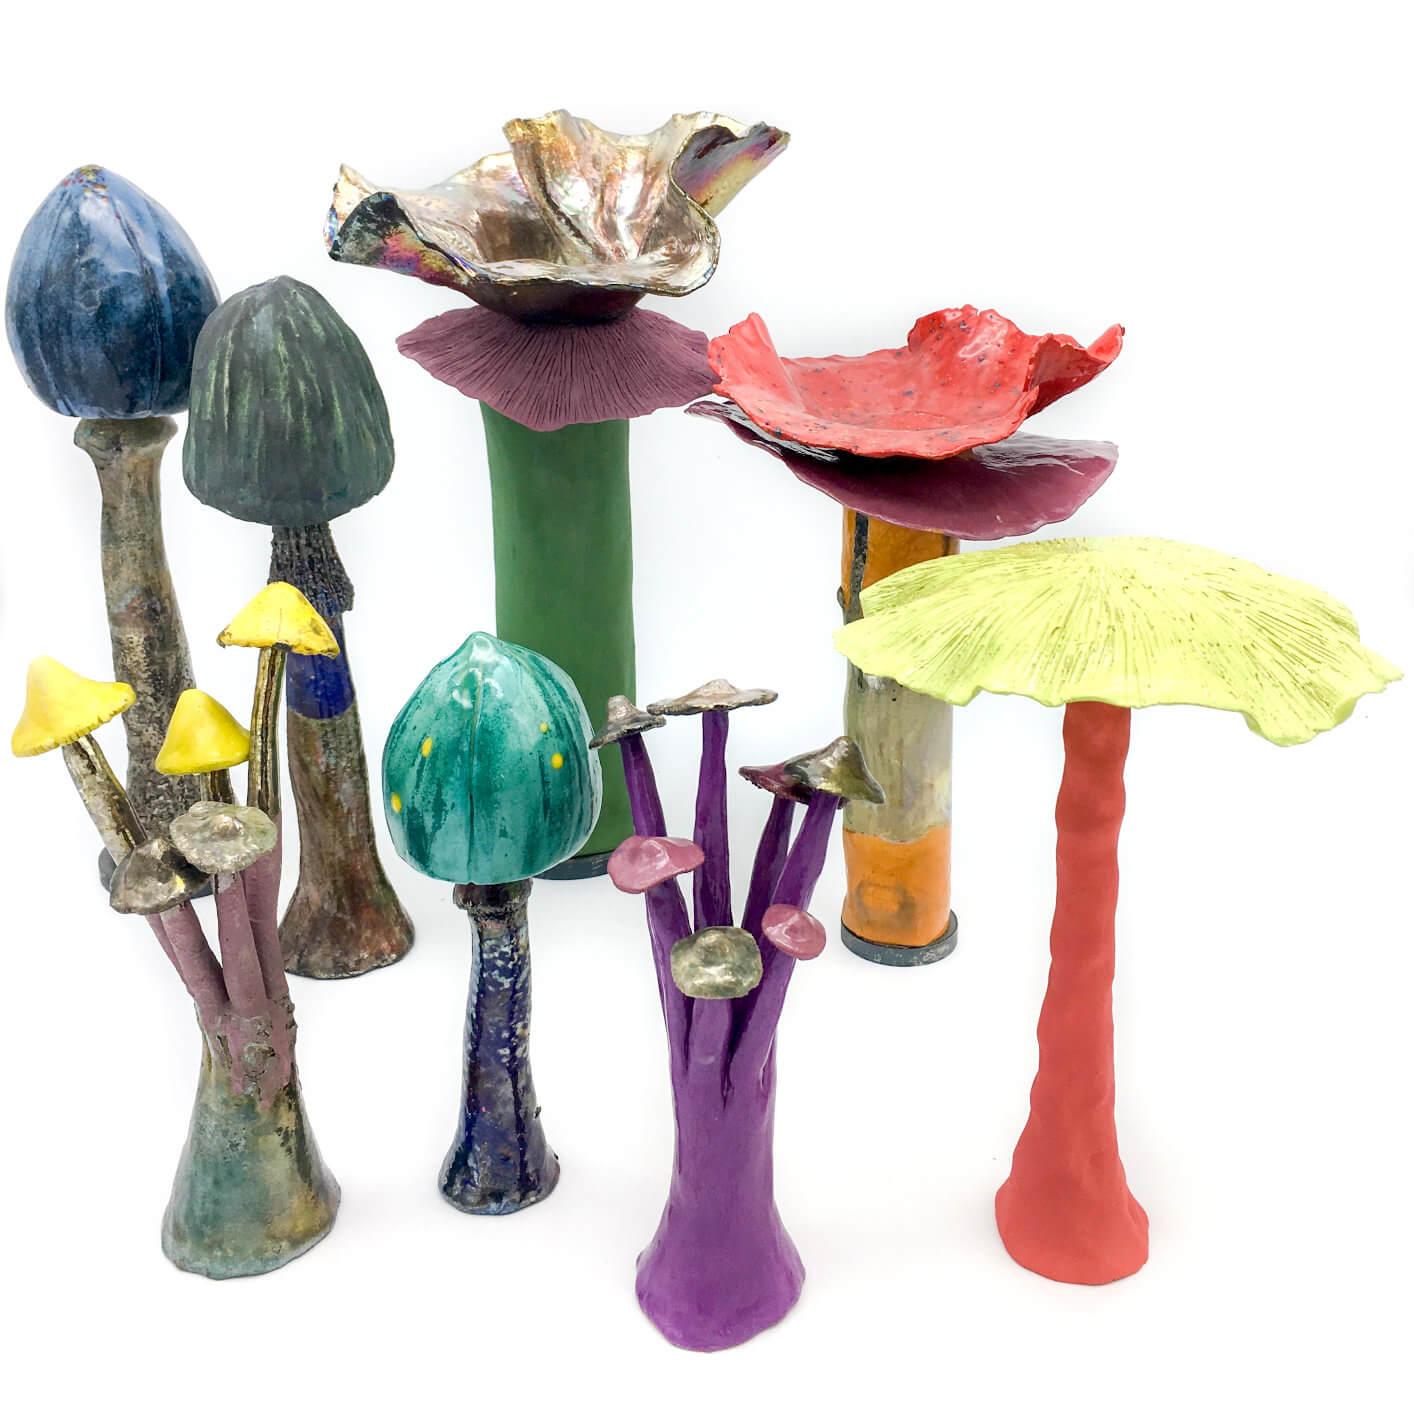 Set Funghi #9 - Zanellazine